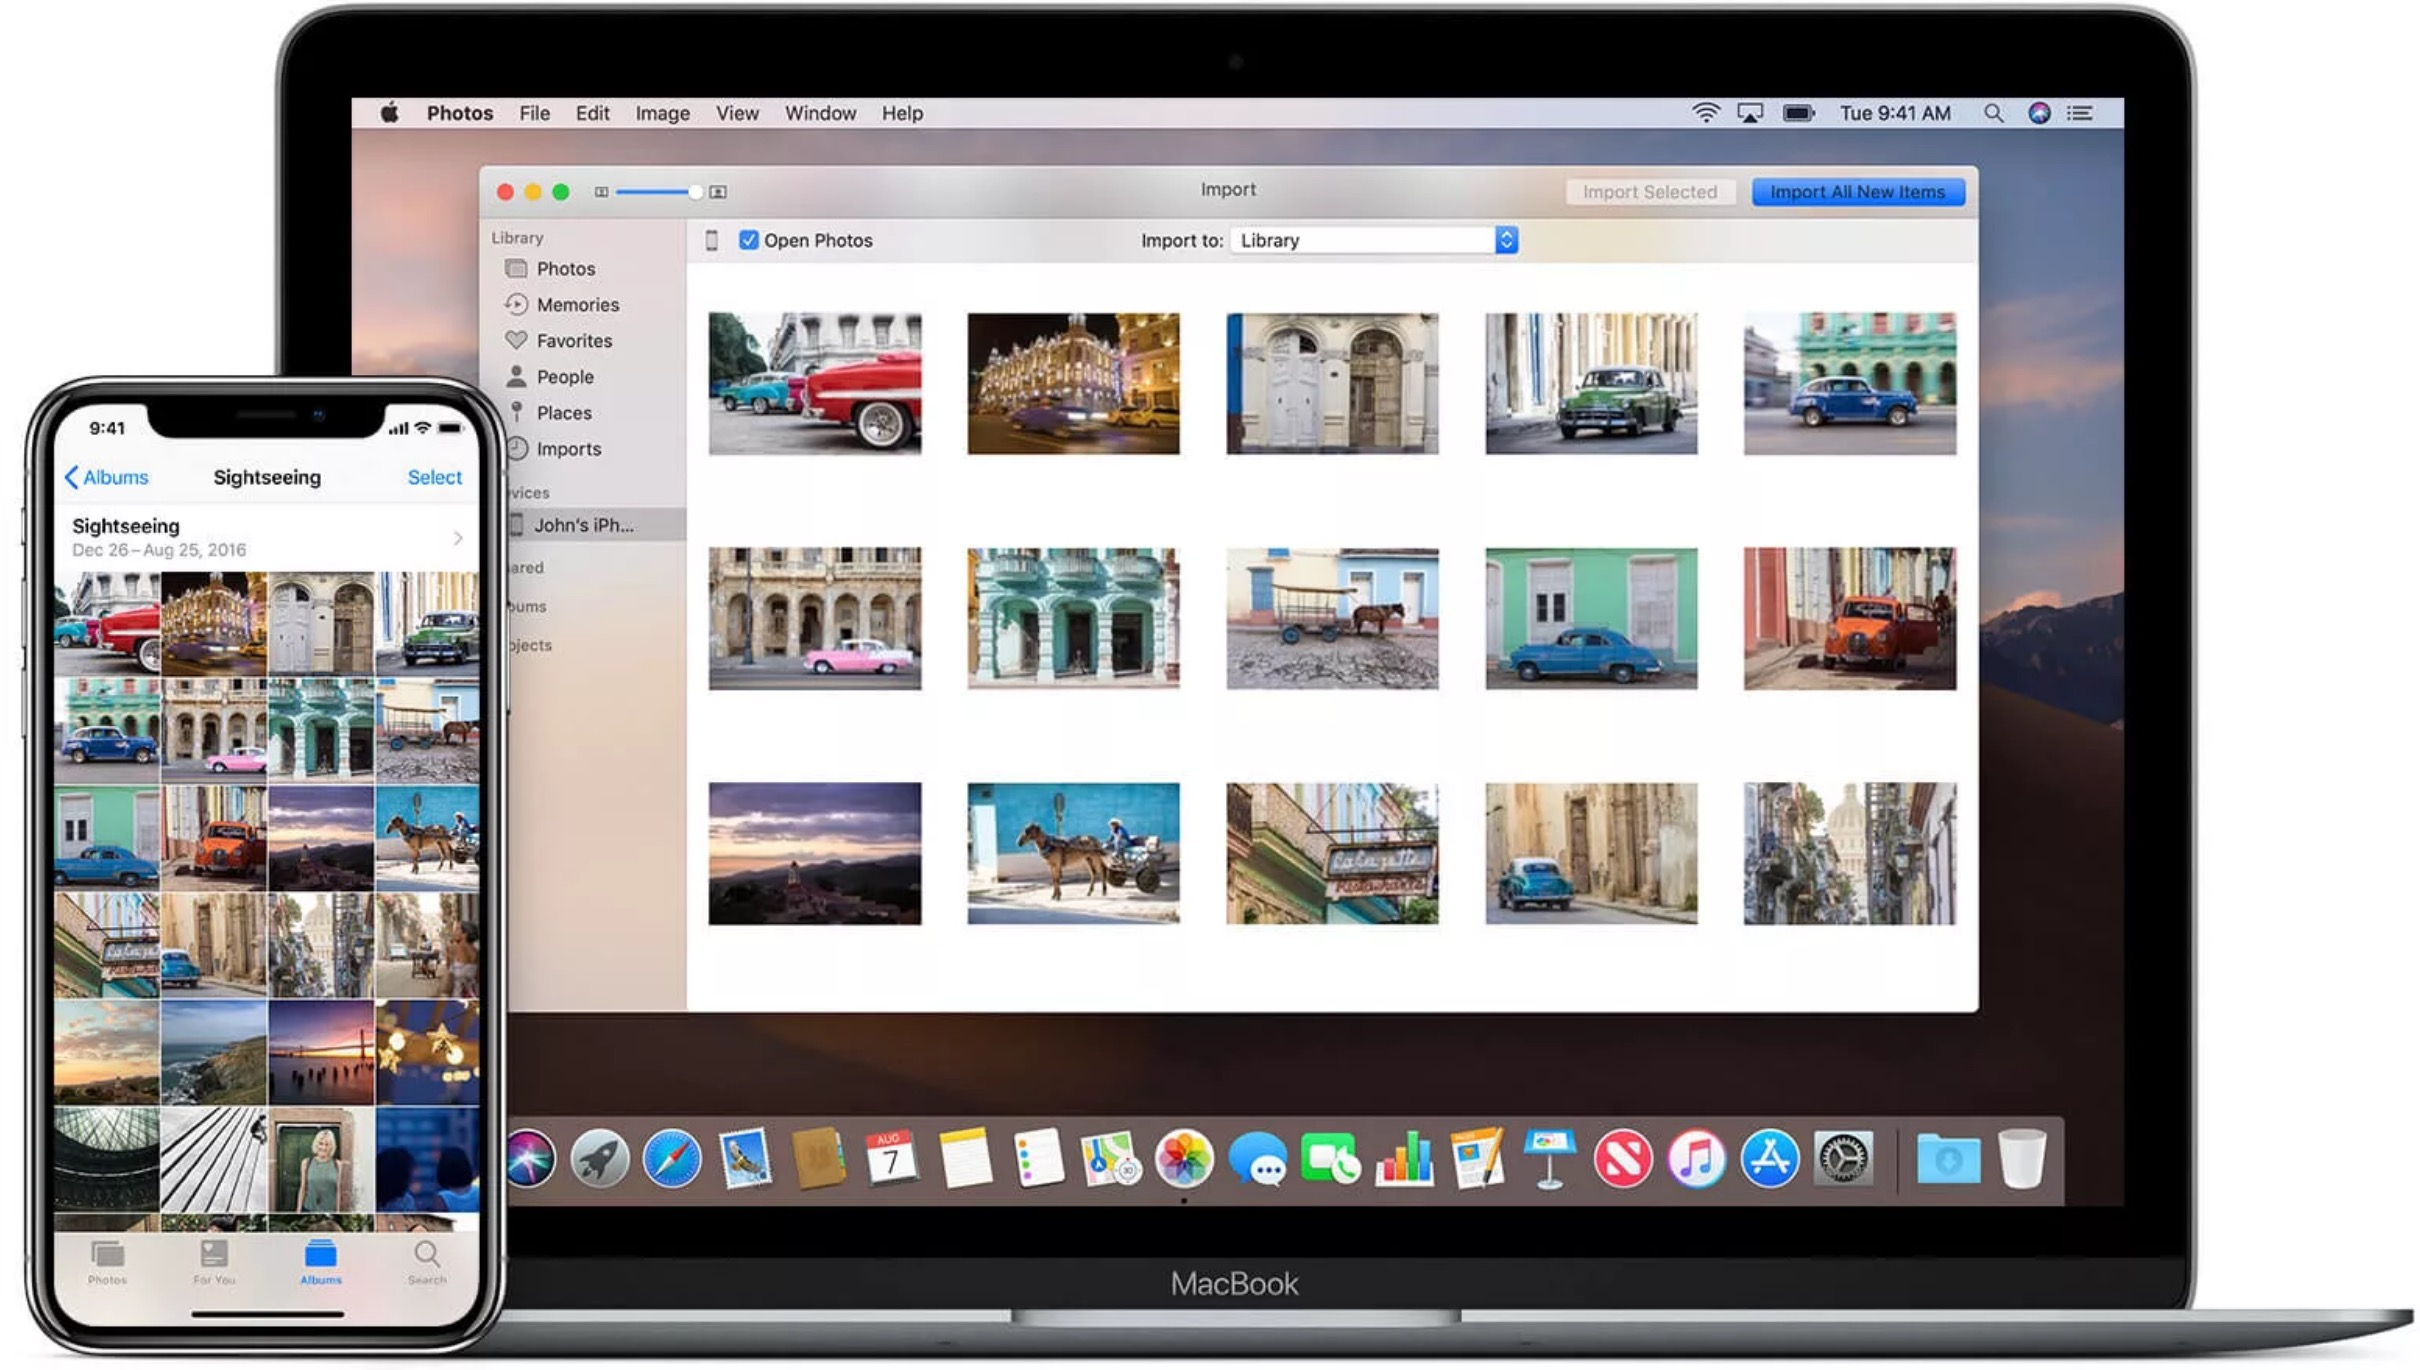 Как перенести фотографии с iPhone или iPad на Mac